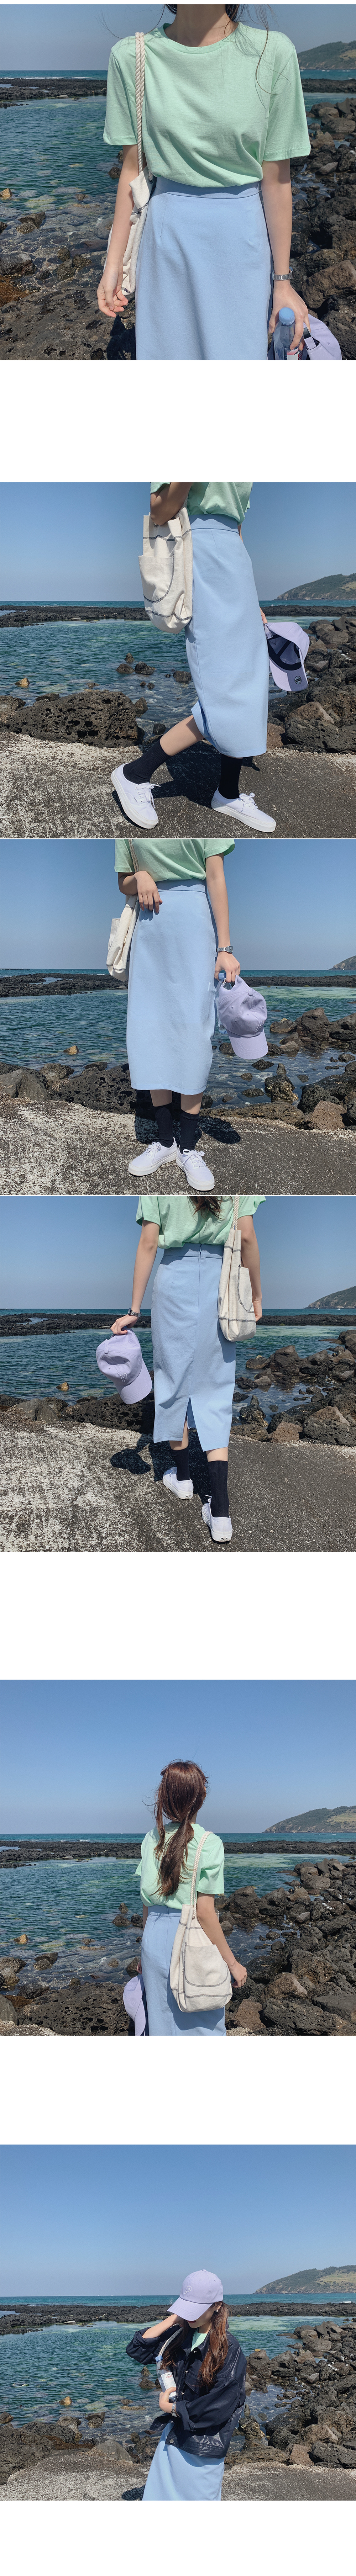 Mizen colored skirt